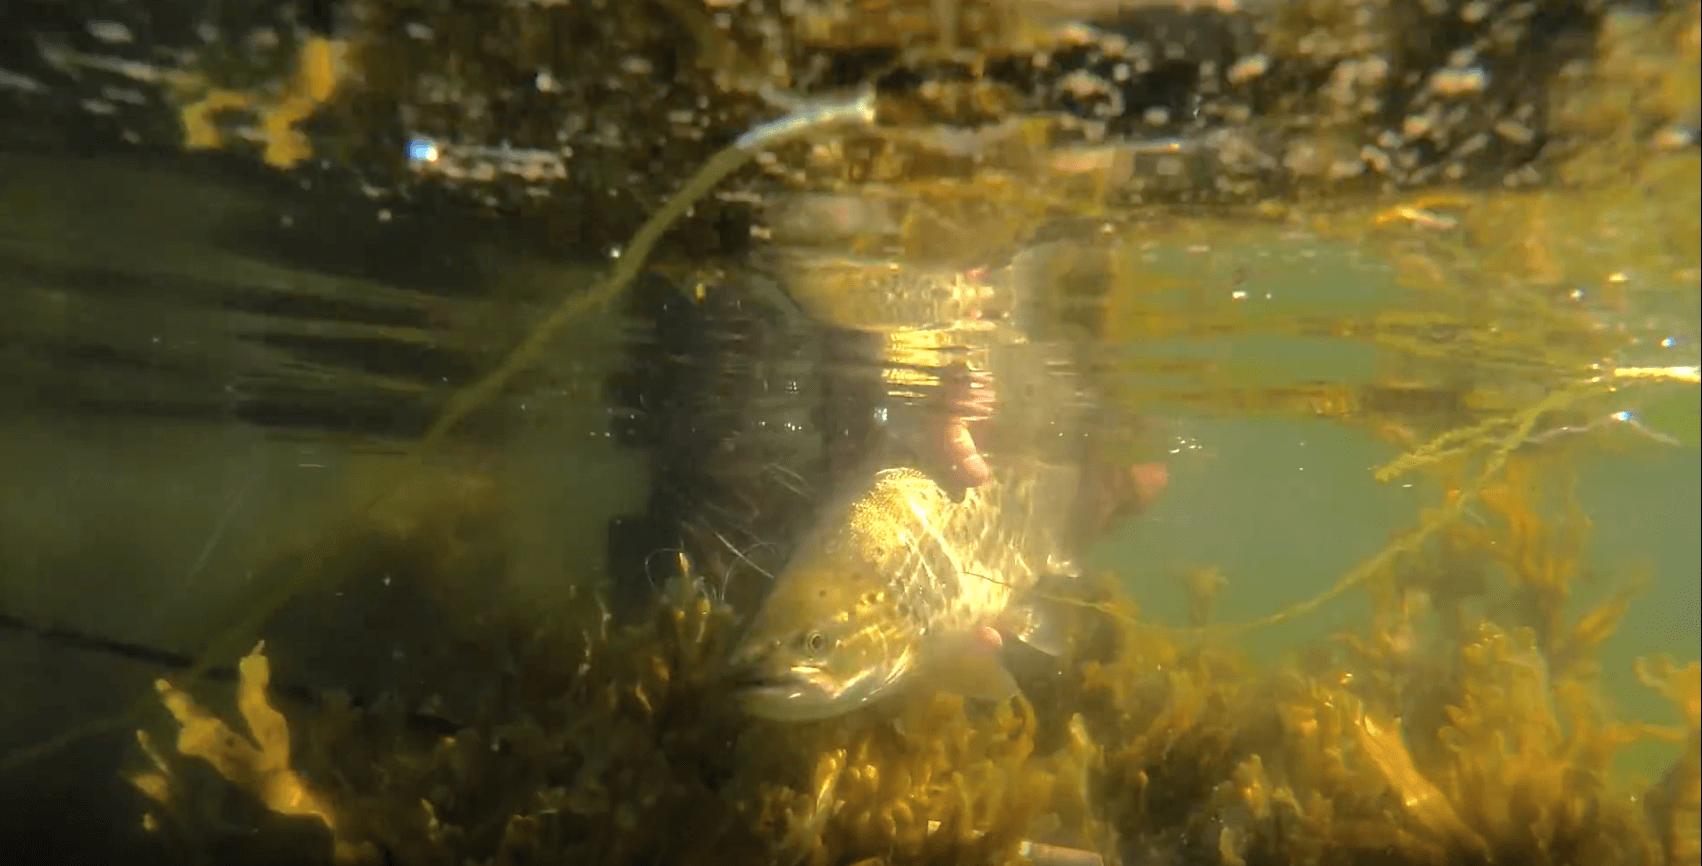 Fly Fishing Herbst - En fiskefilm fra Efteråret